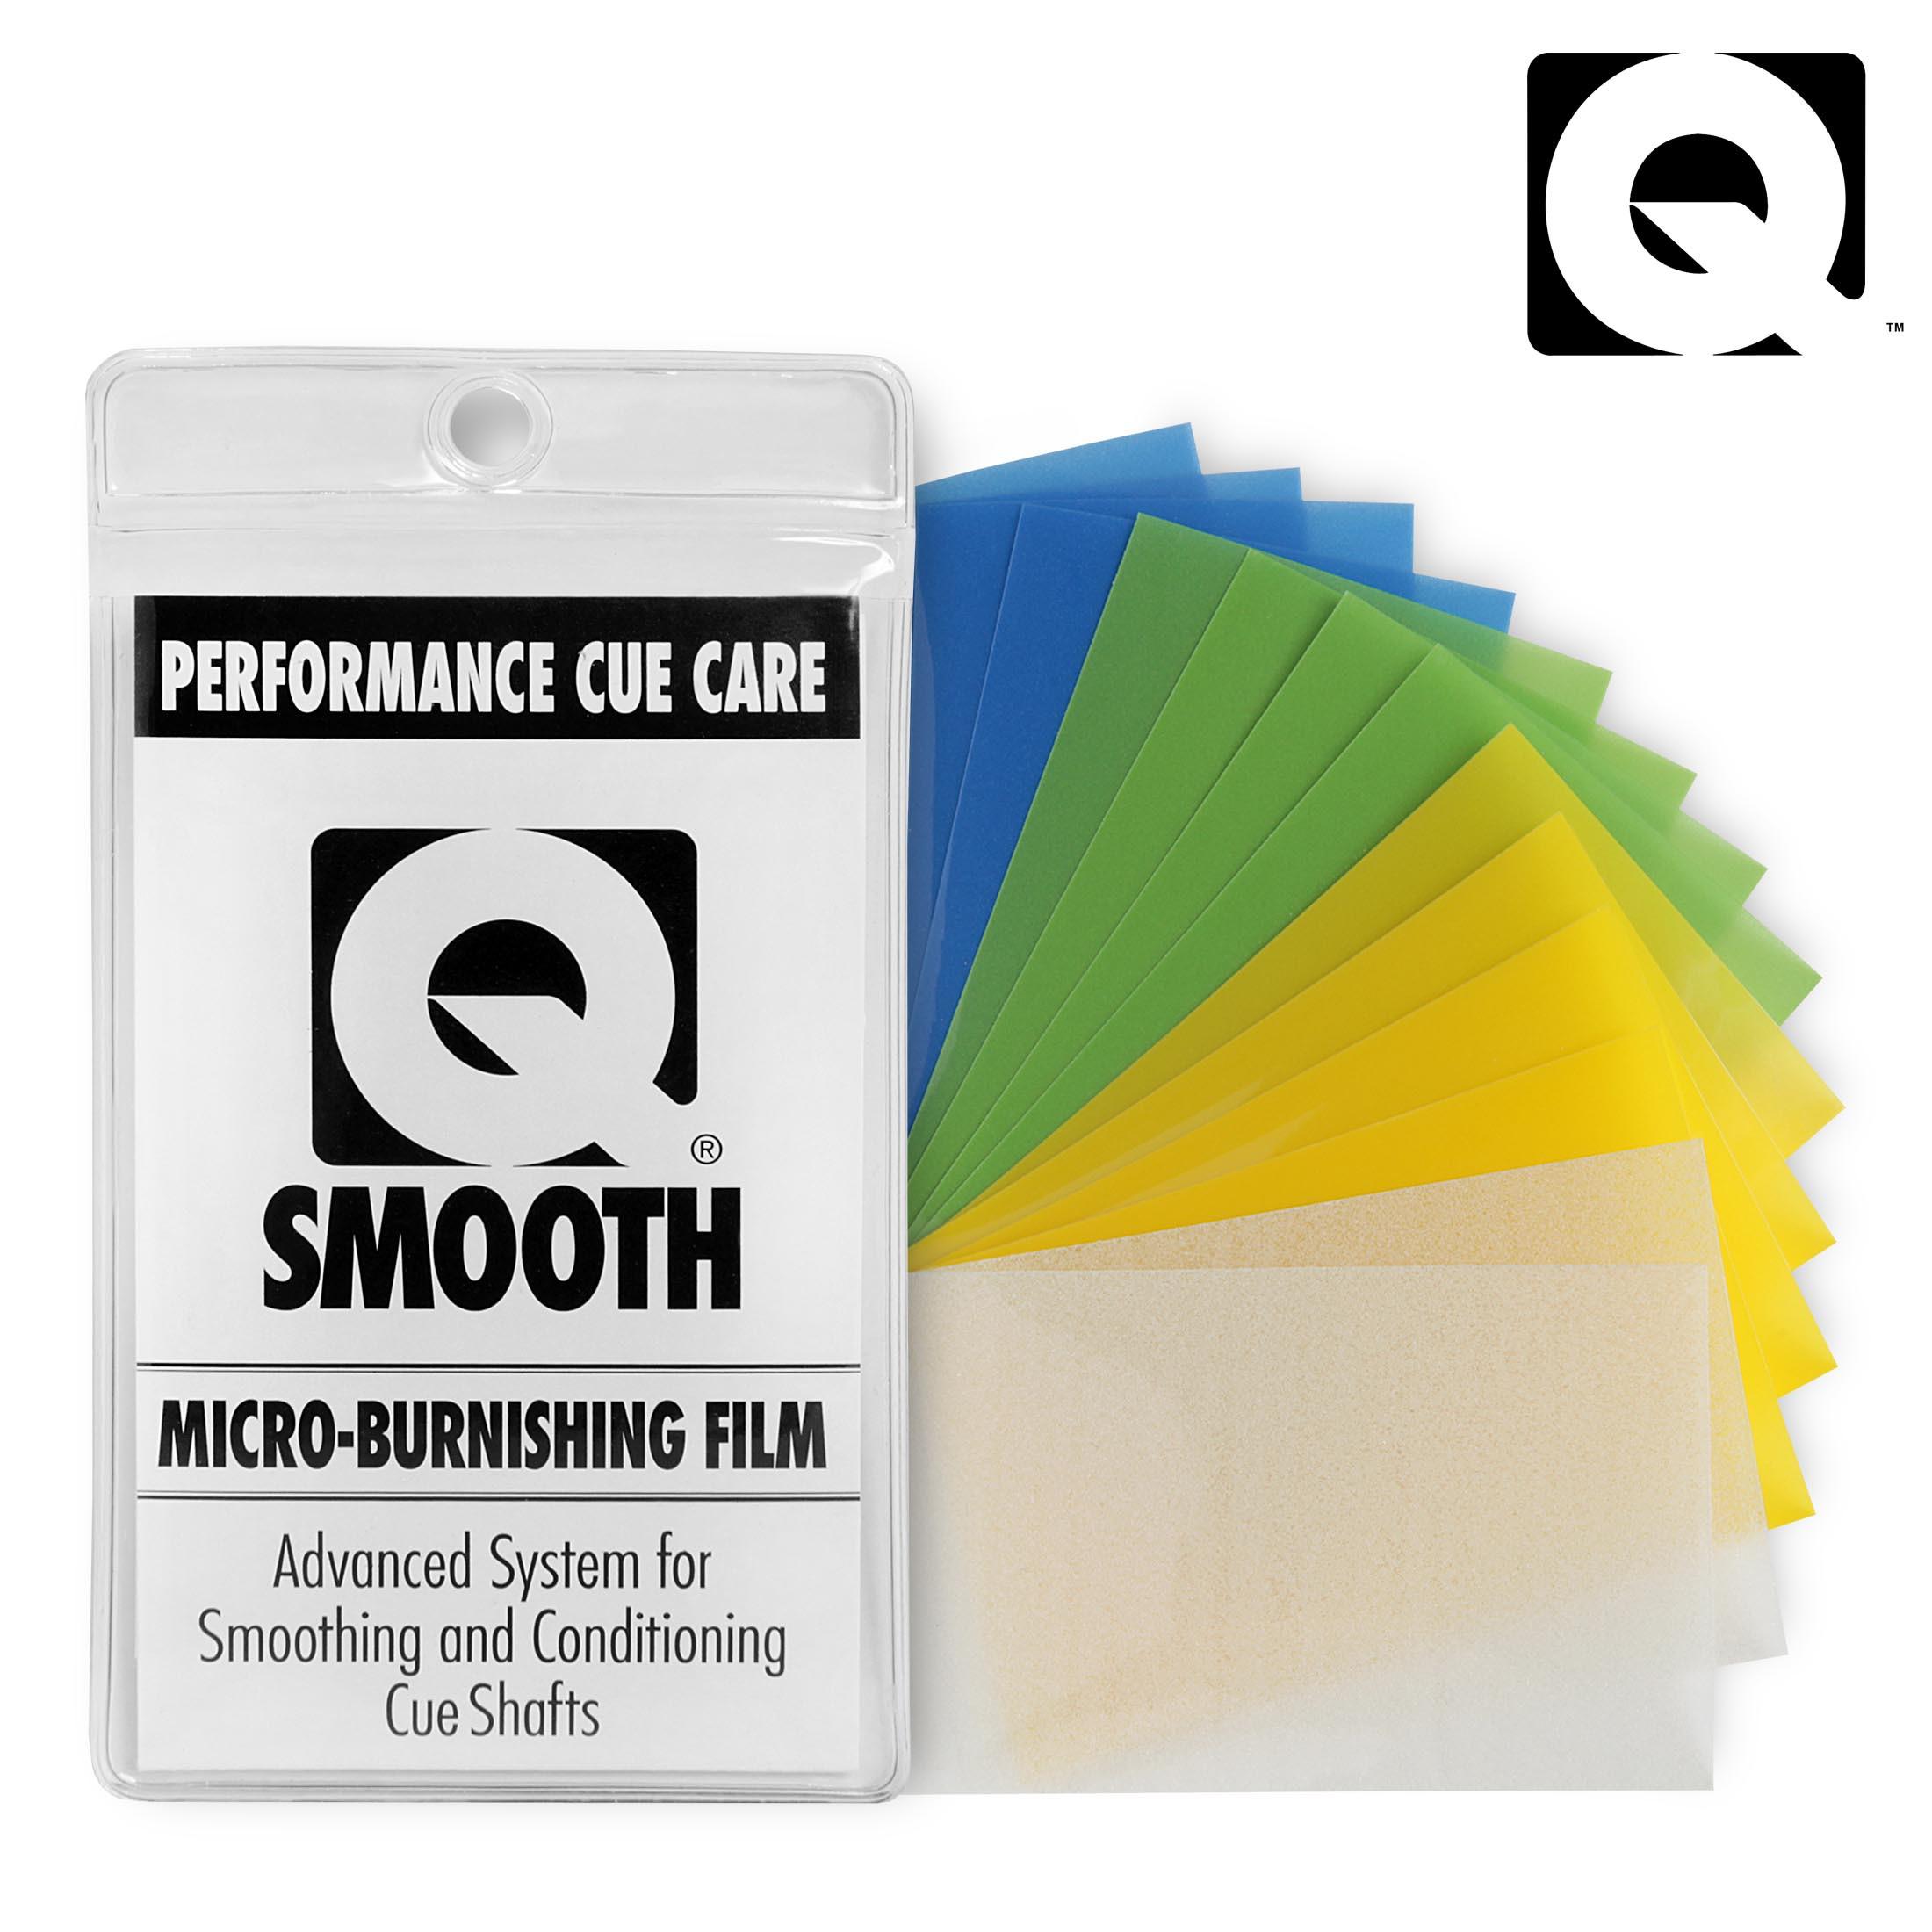 Набор средств по уходу за кием Q Care Kit